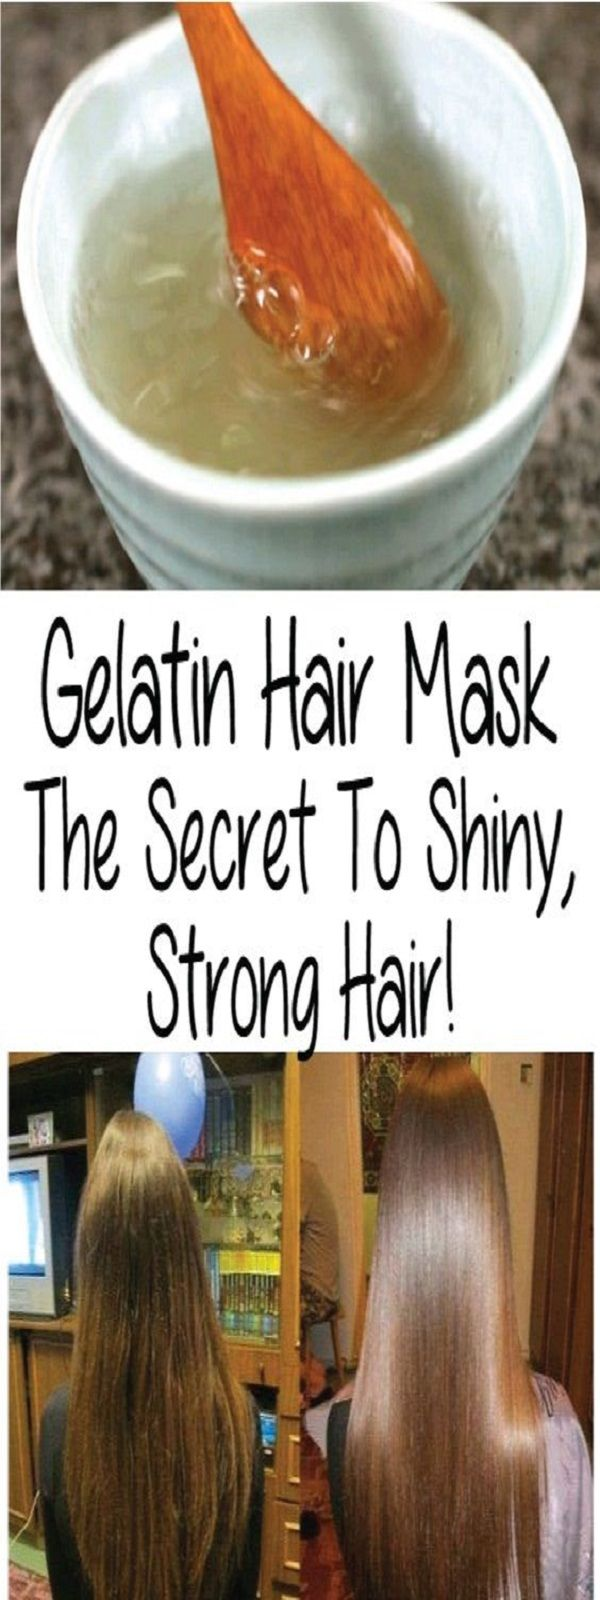 Gelatin treatment - myth or reality